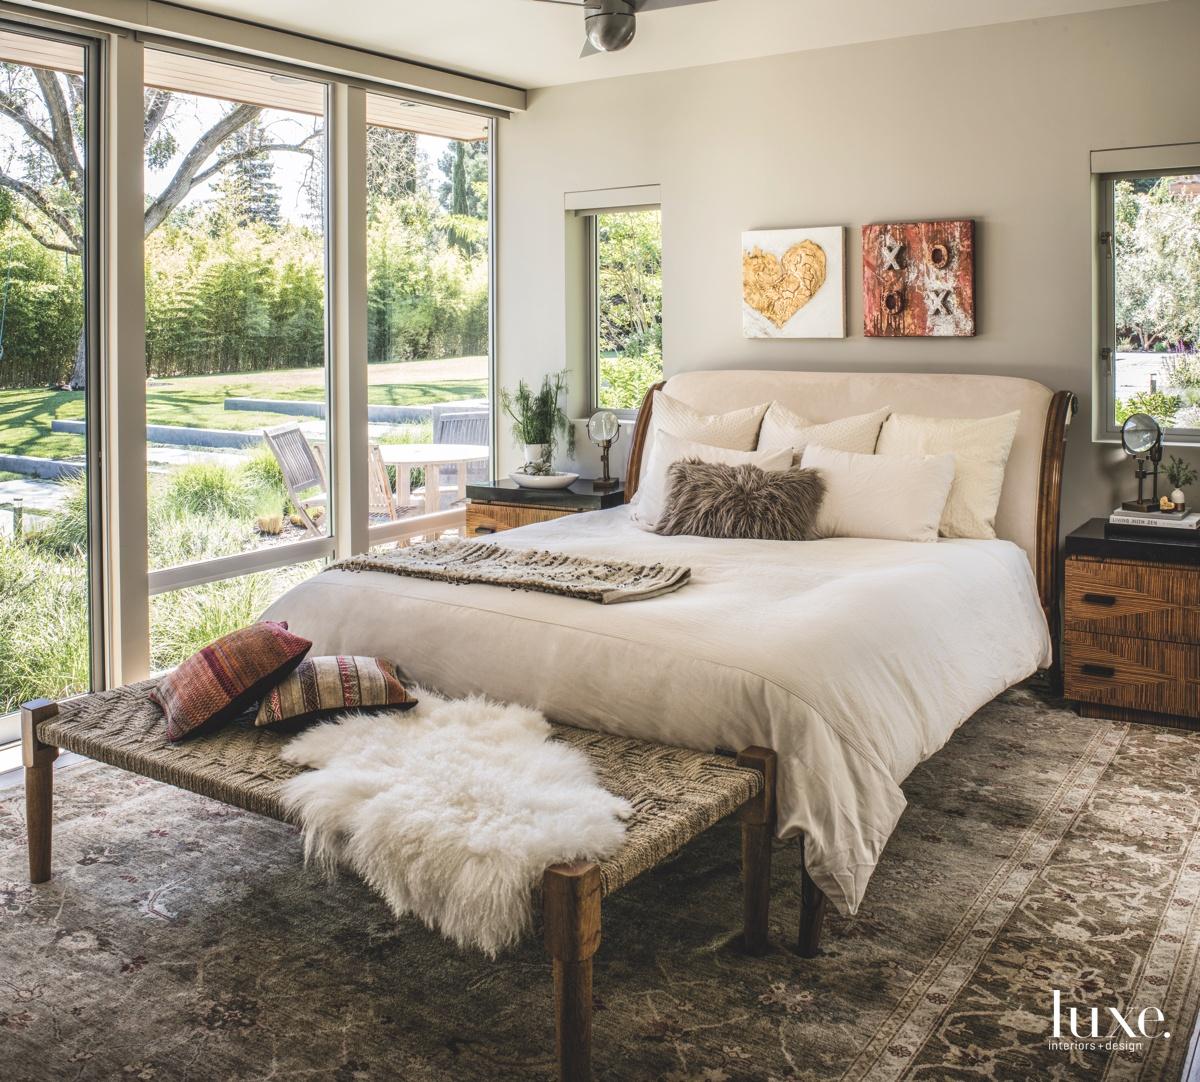 bedroom glass windows woven bench...